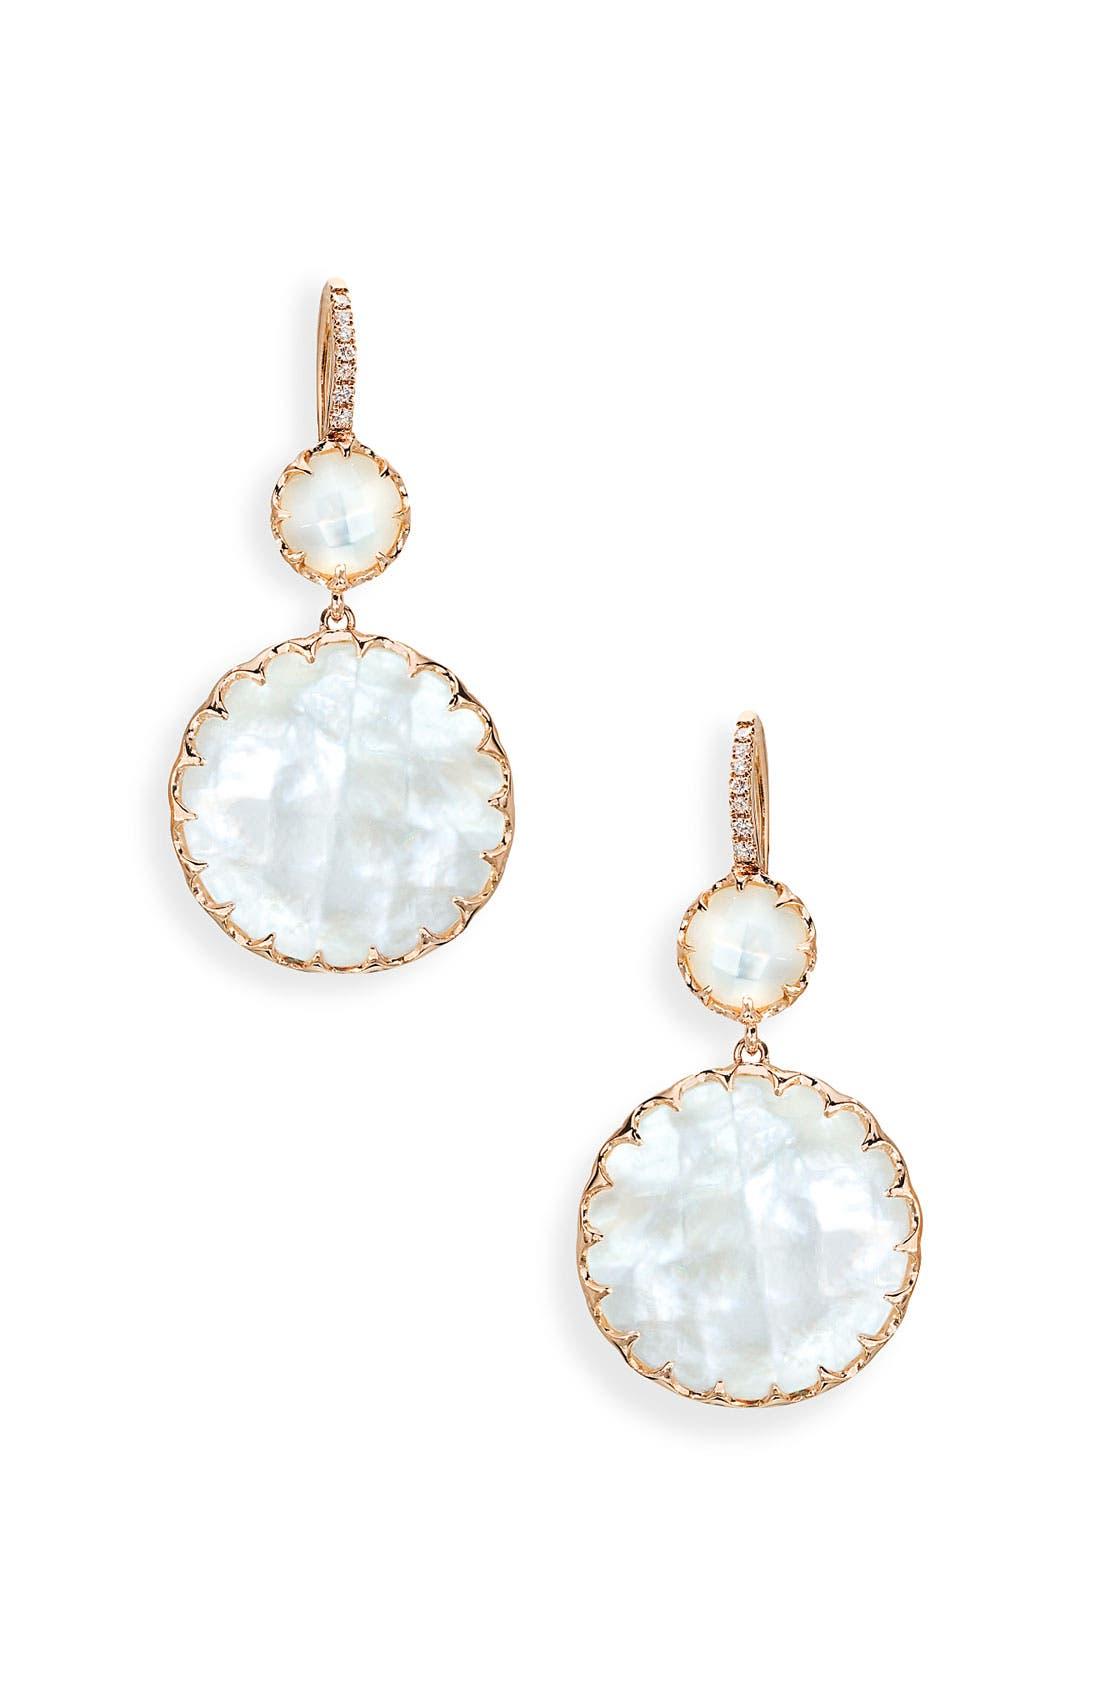 Main Image - Ivanka Trump 'Rose Gold' Stone & Diamond Earrings